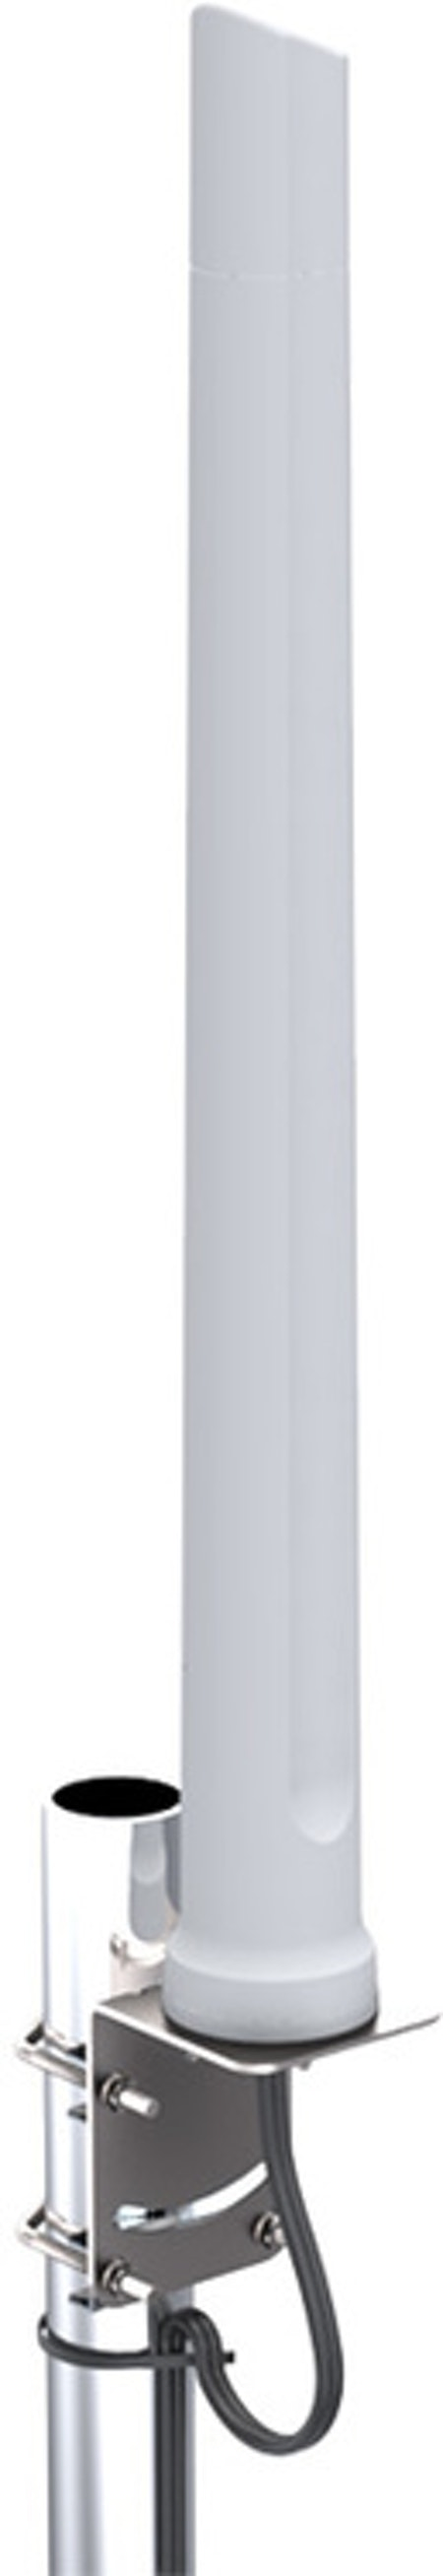 Poynting Rundstrålande antenn 6 dBi SMA 8m kabel